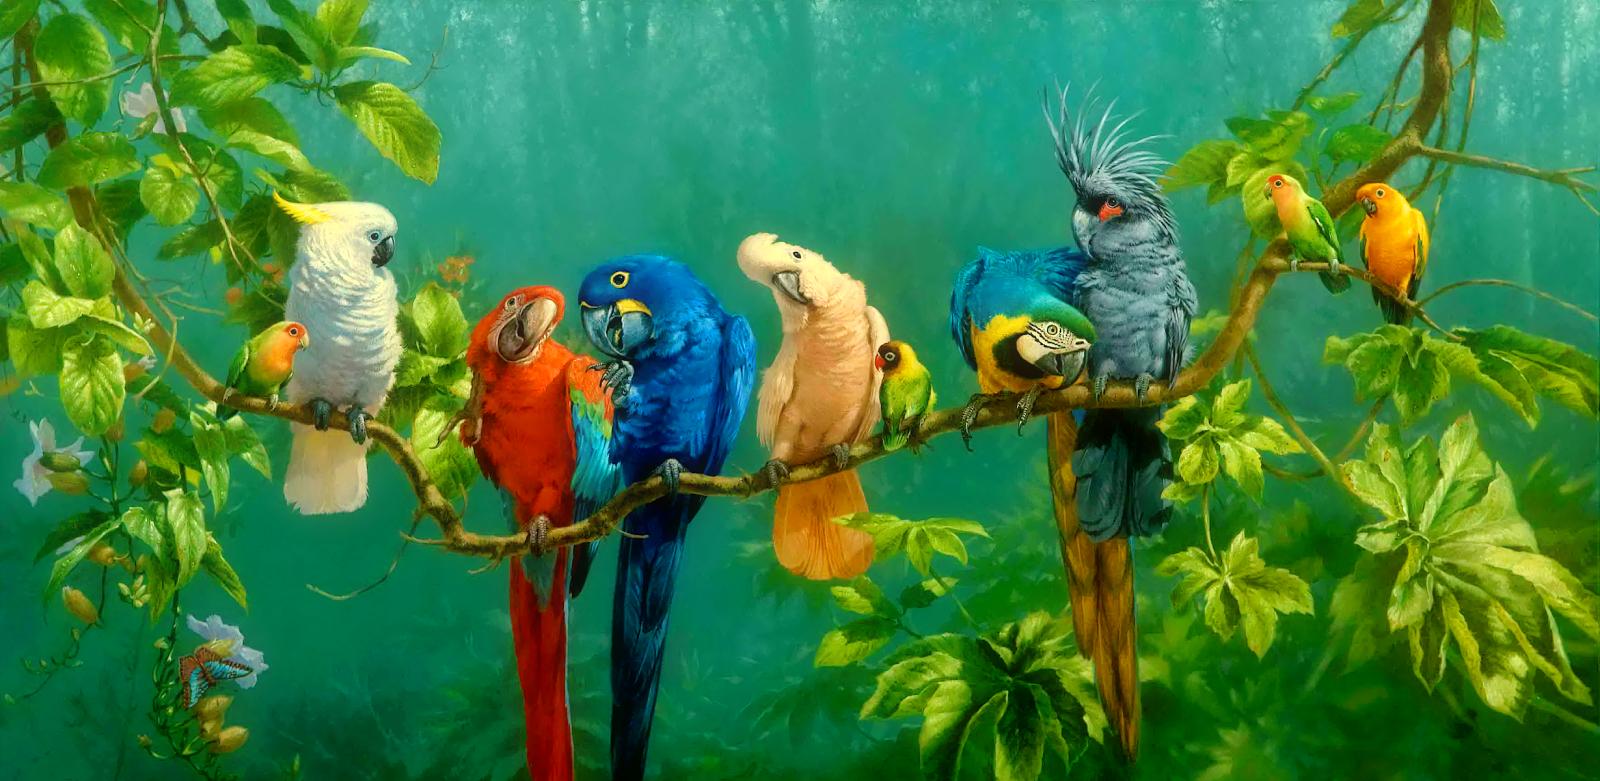 Fond ecran gratuit printemps animaux fonds d 39 cran hd for Fond ecran animaux hd